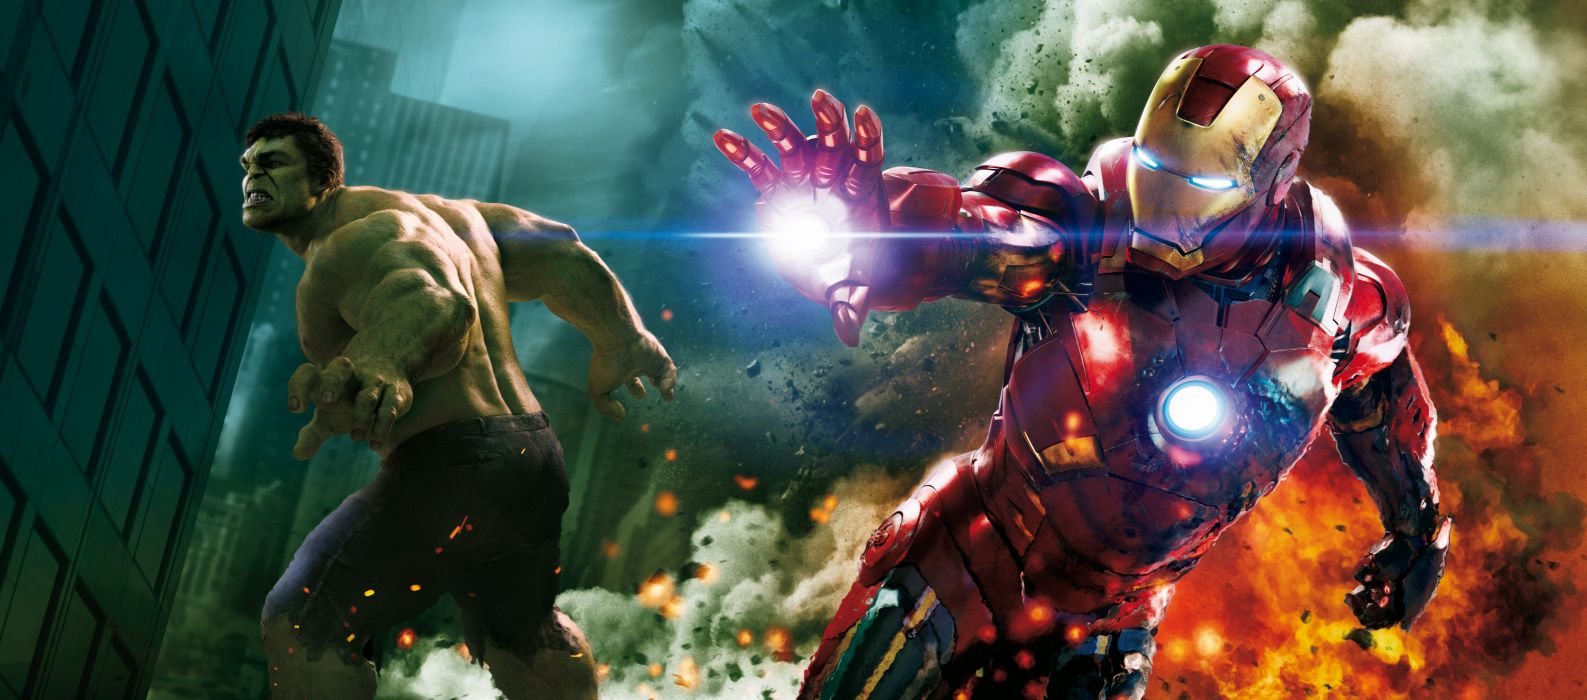 Avengers Movie - Avengers hulk iron man wallpaper